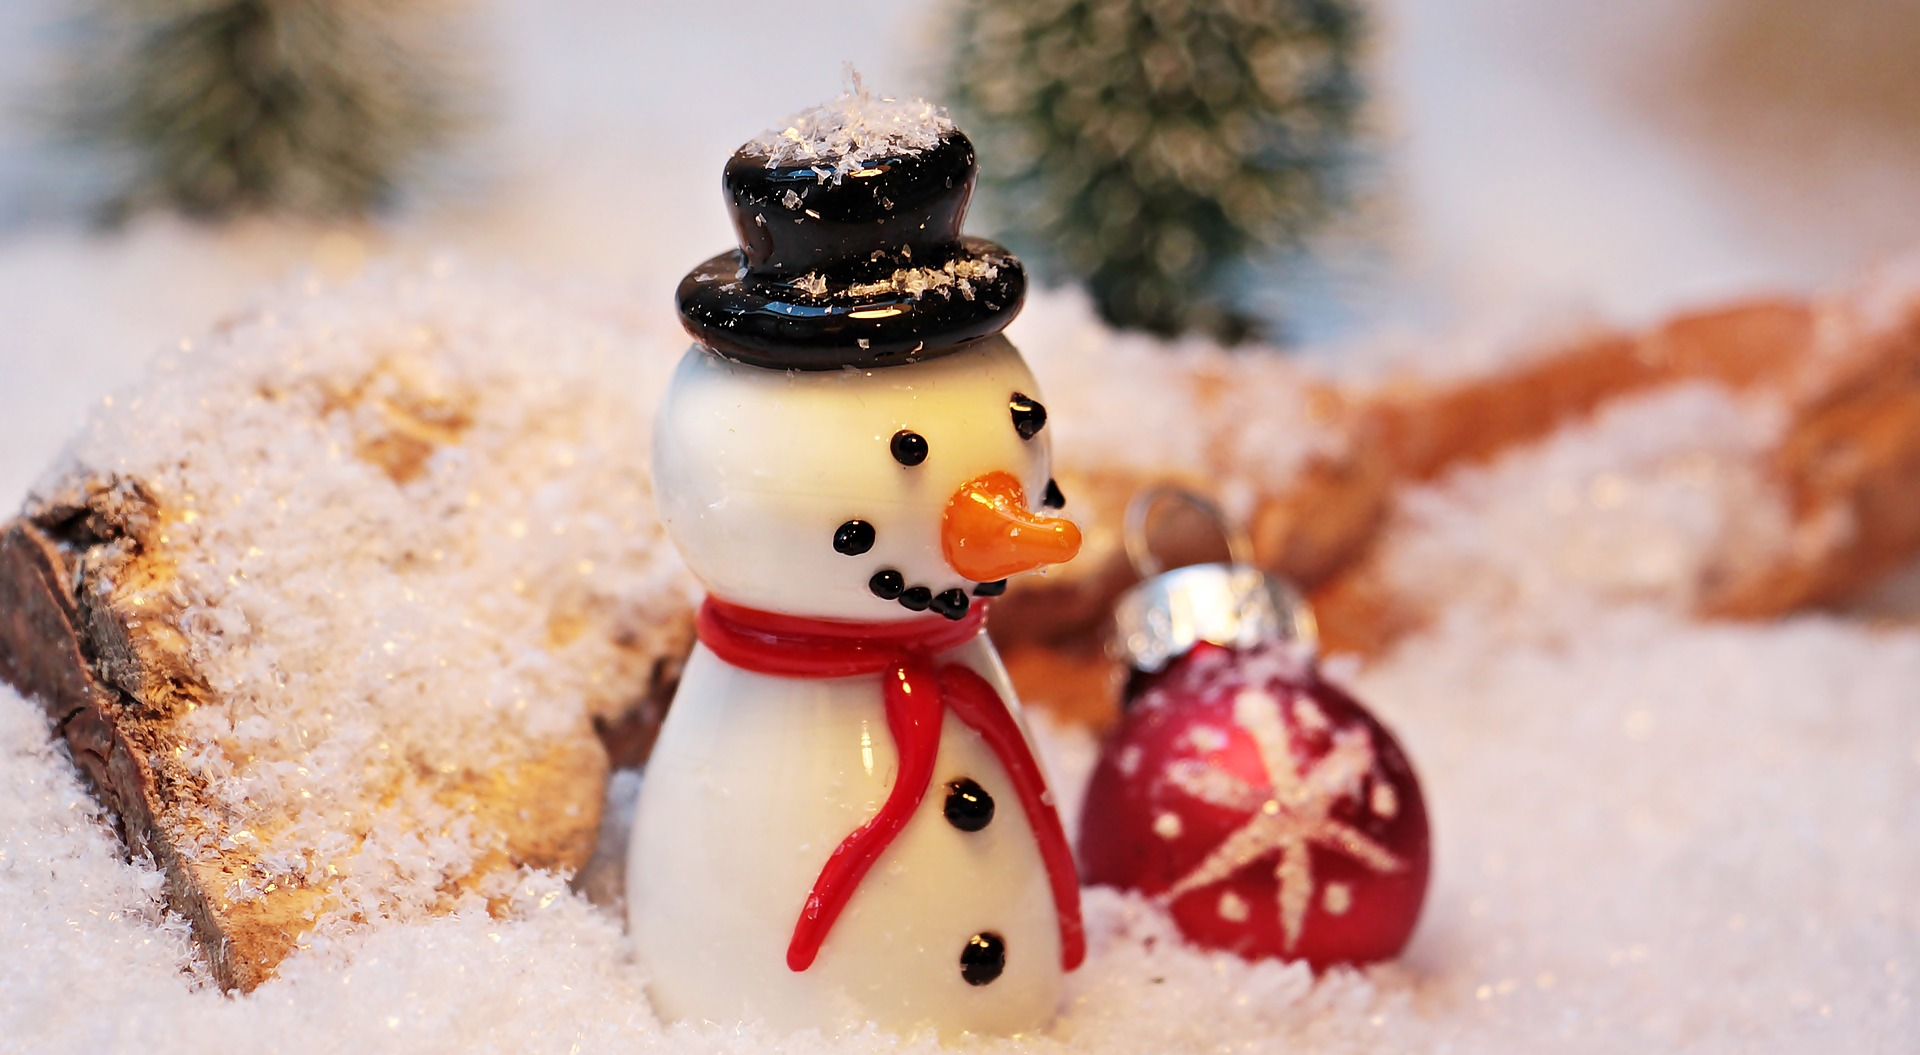 snow-man-1872167_1920.jpg